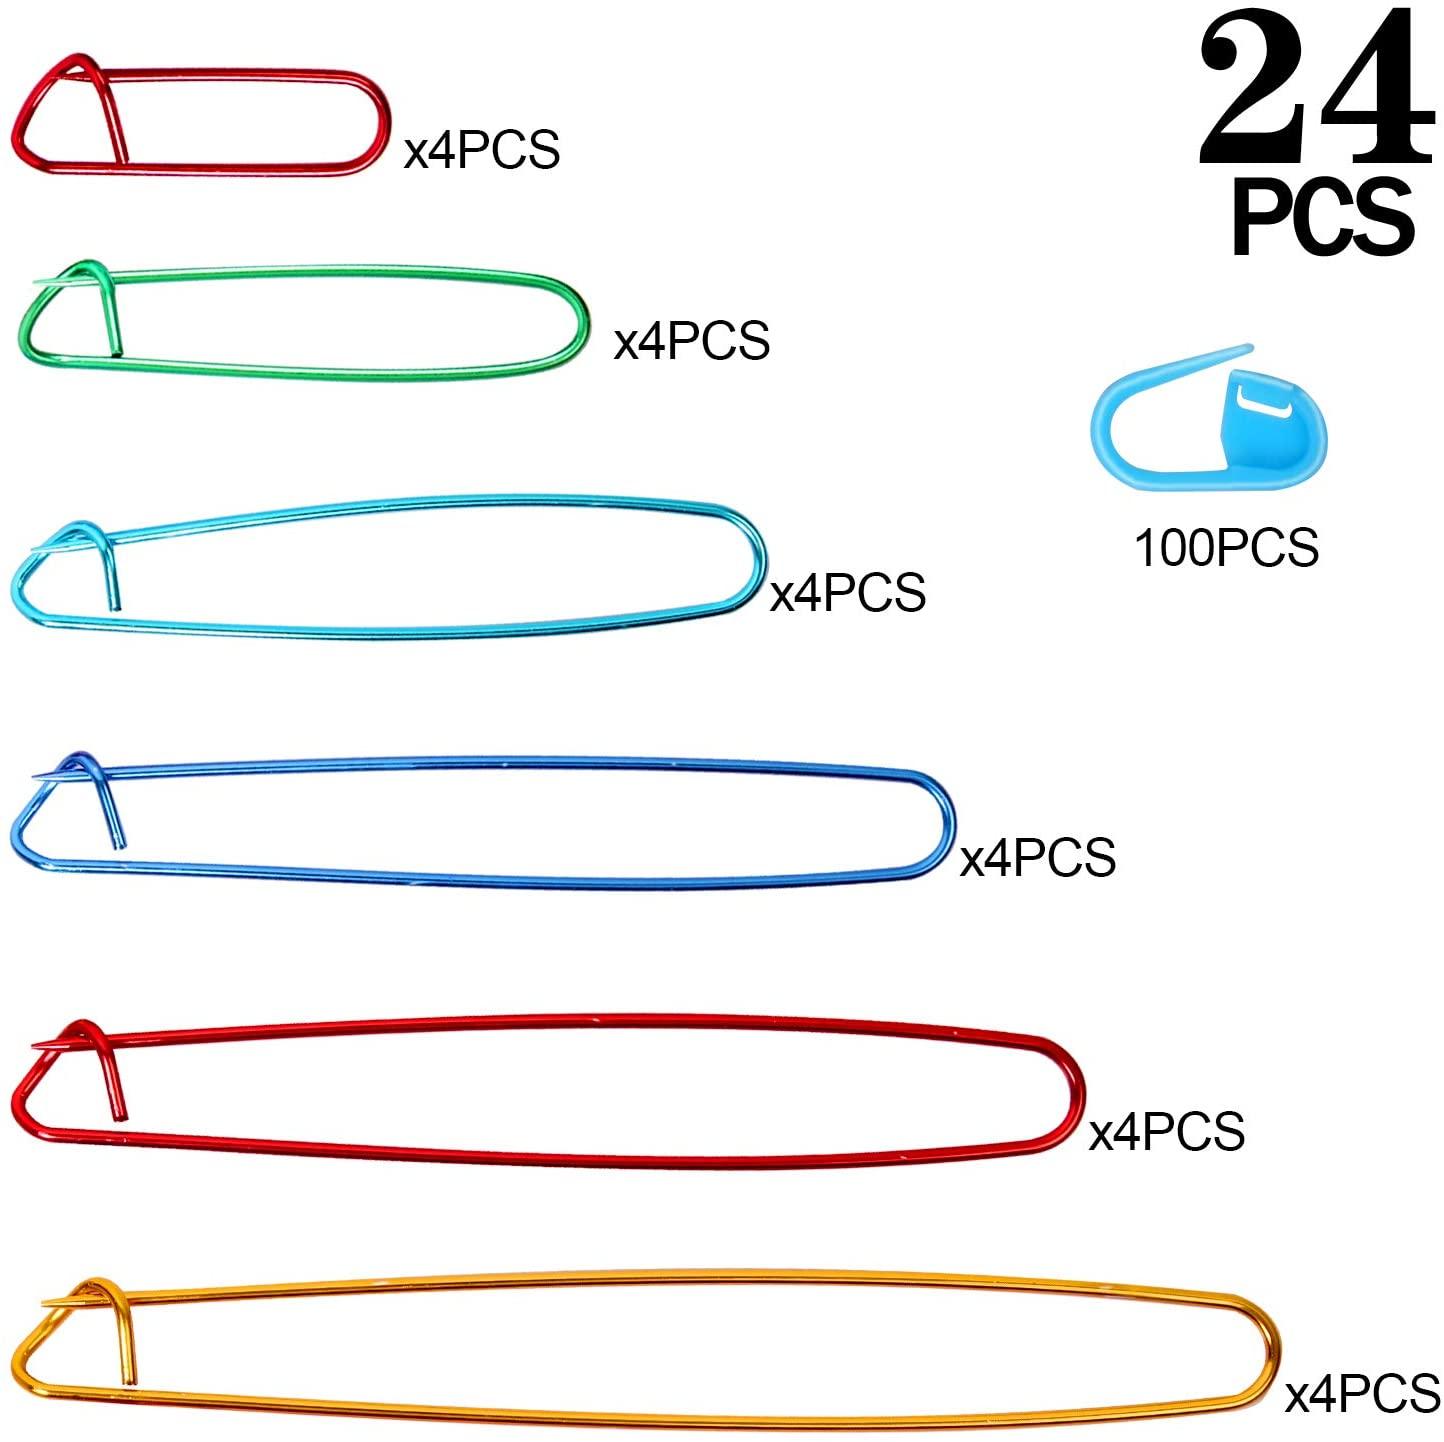 KEILEOHO 24 PCS Multi-Colored Knitting Stitch Holders, Stitch Holders with 100 PCS Colored Positioning Buckles, Aluminum Yarn Stitch Holders for Knitting Notions or Crochet, 6 Sizes